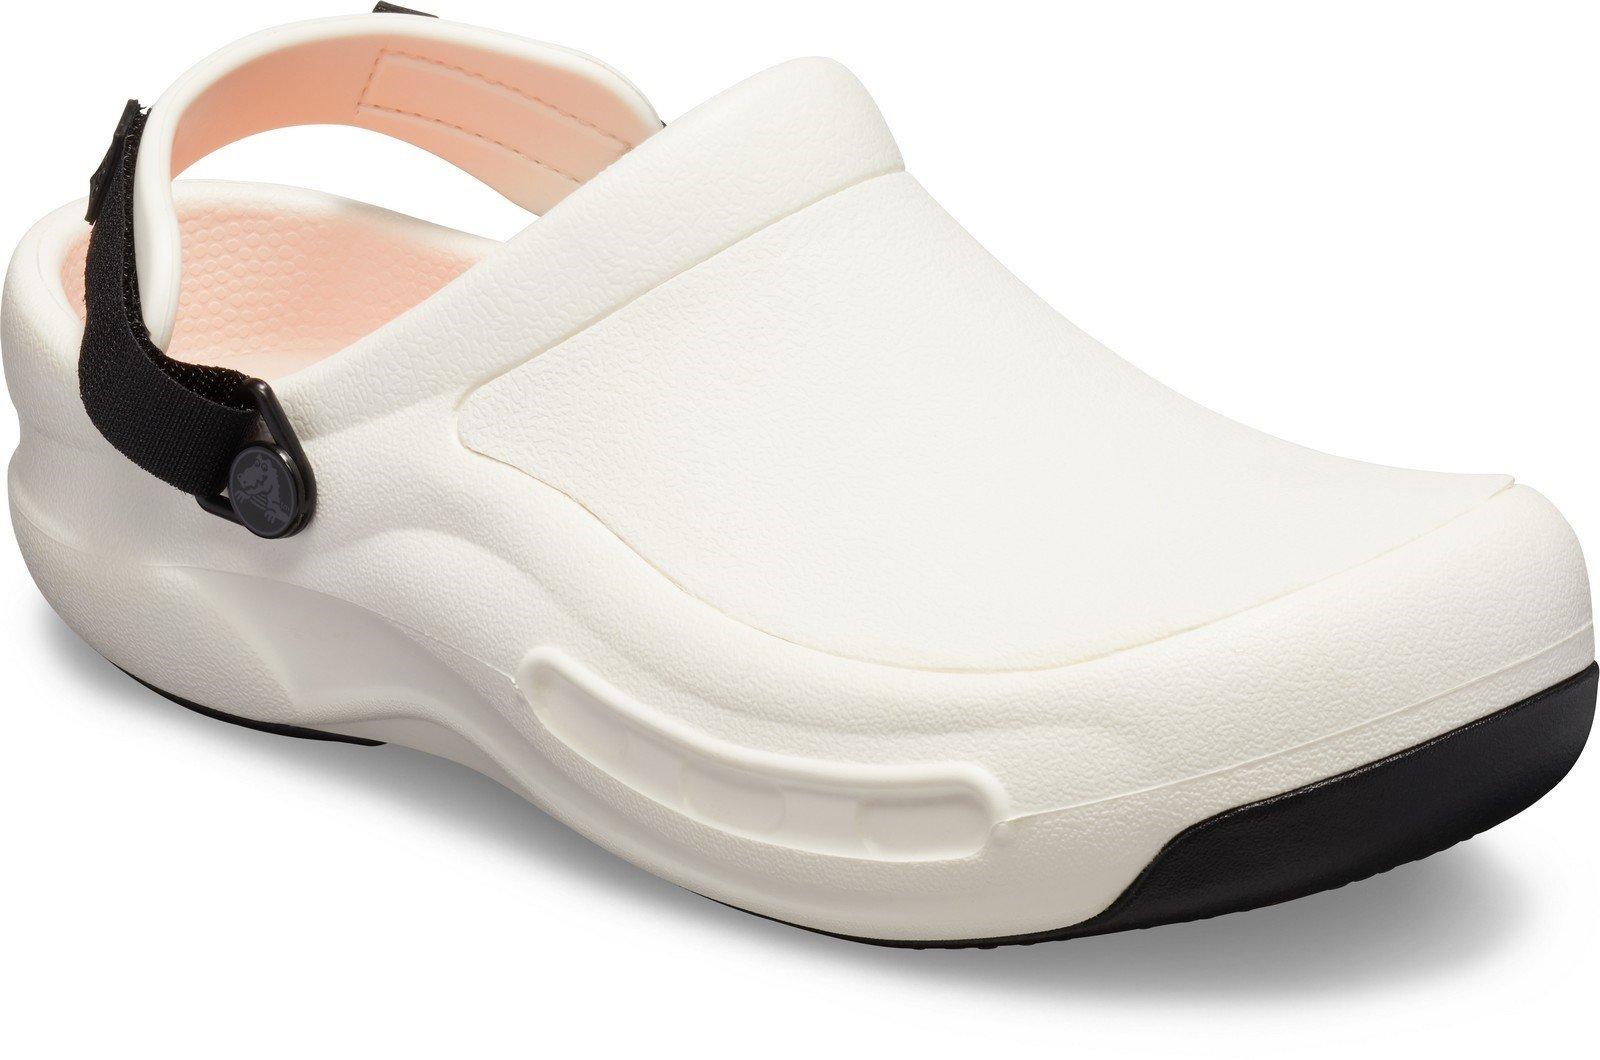 Crocs Unisex Bistro Pro Literide Clog Slip On Sandal Various Colours 28785 - White 6